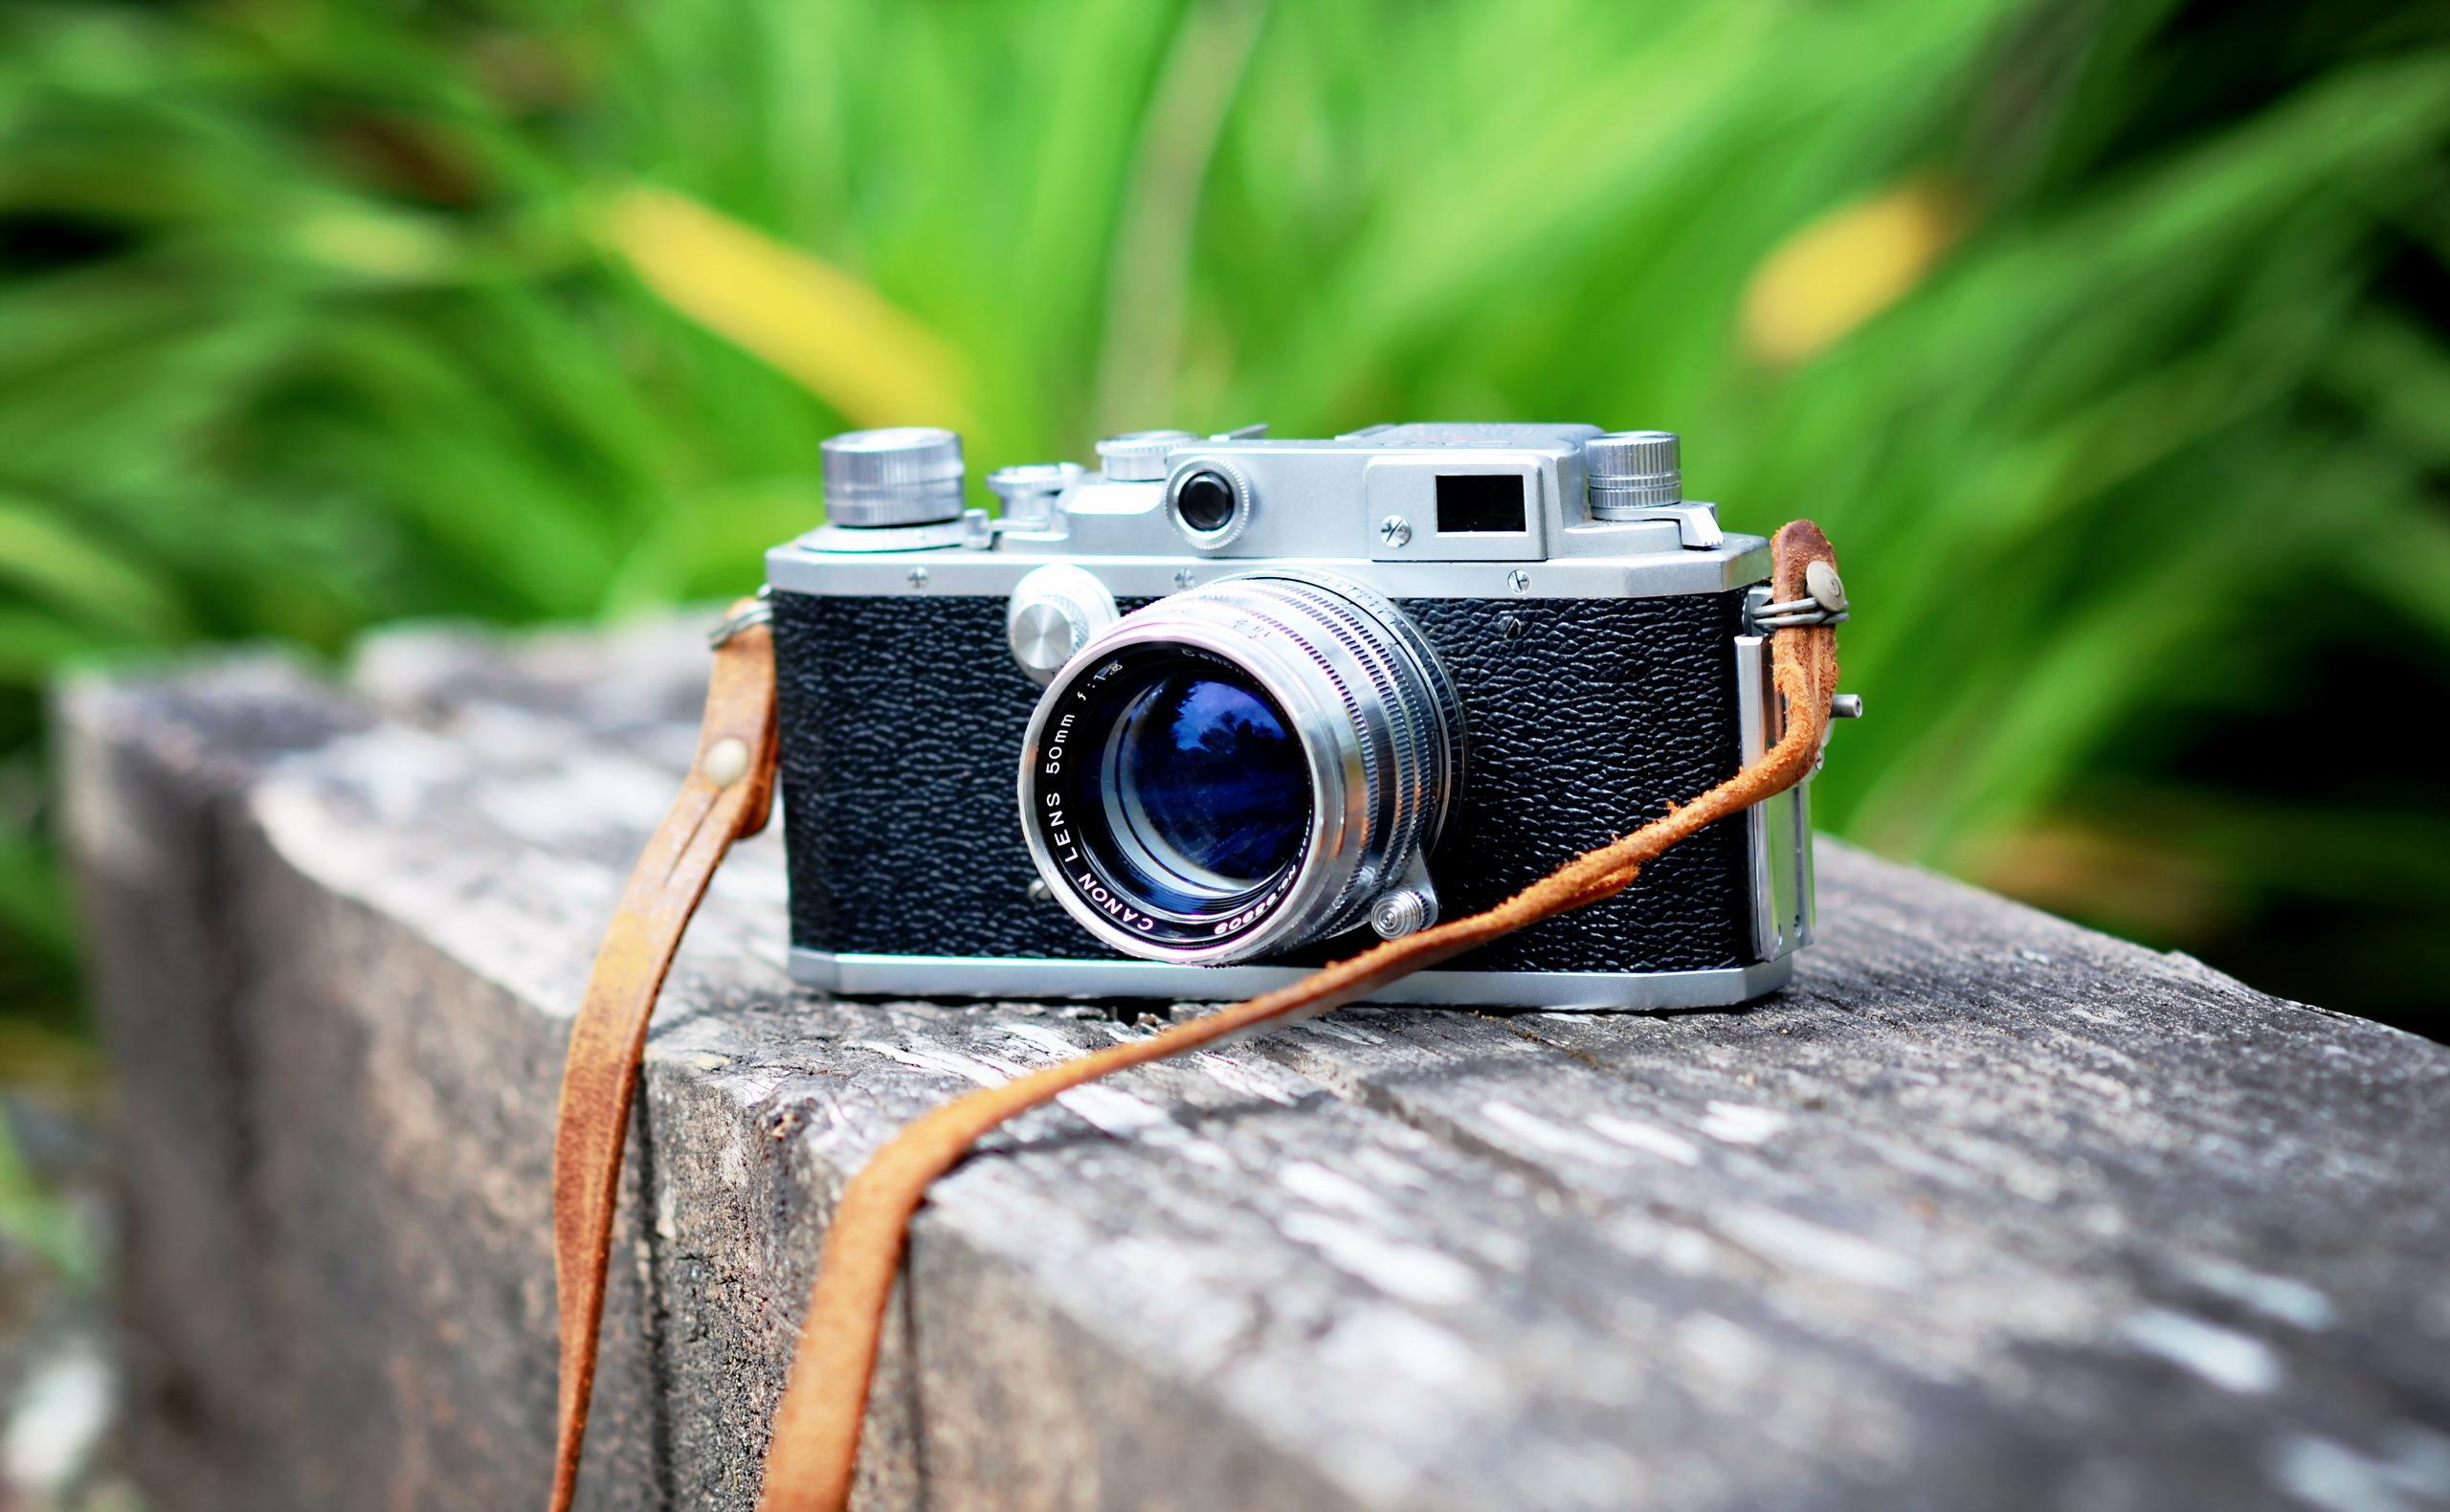 Фотоаппарат Nikon старый  № 3624520 загрузить